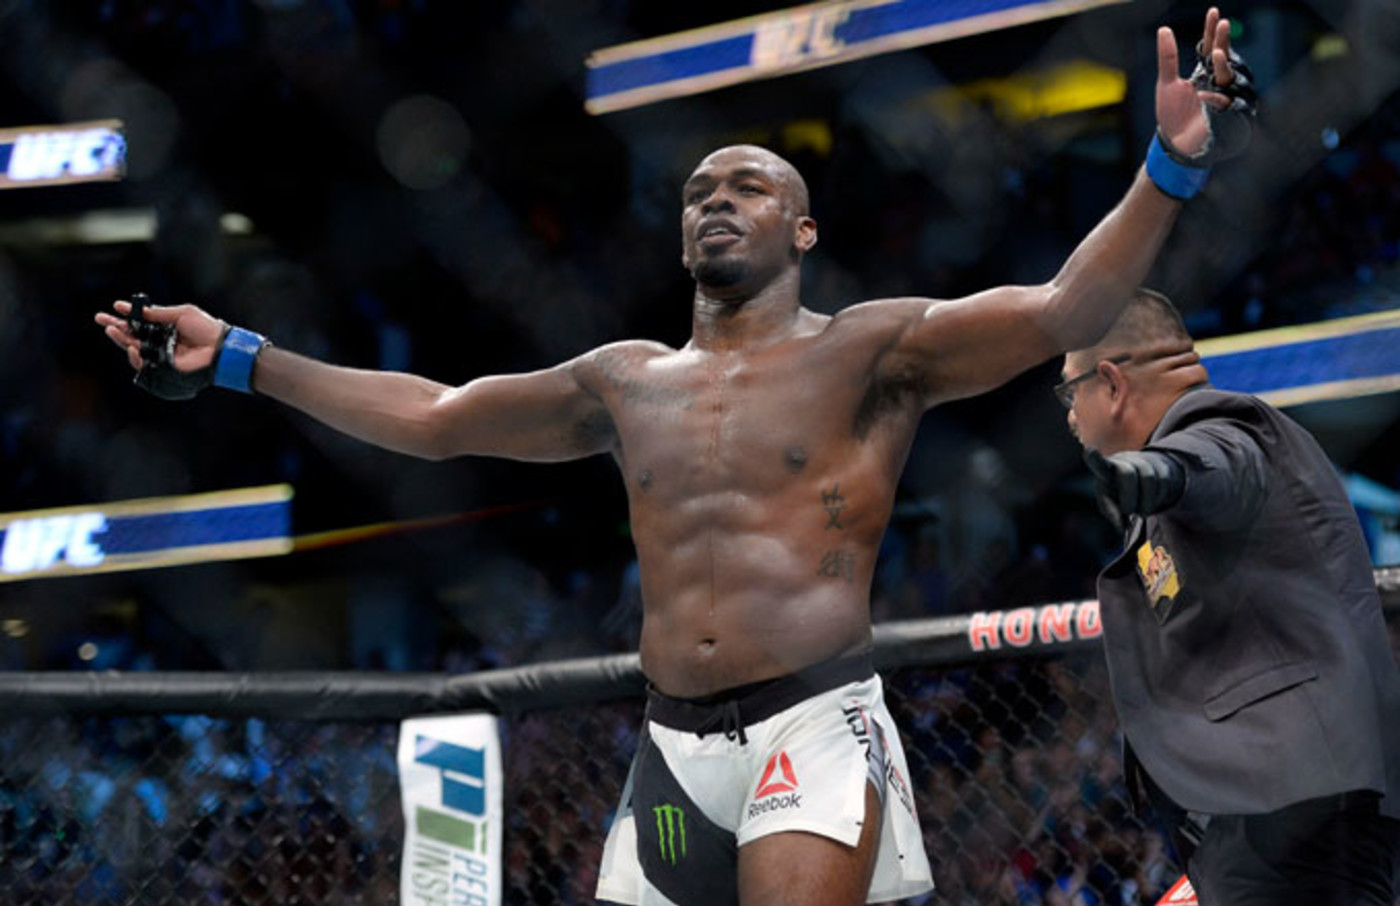 Jon Jones reacts following his victory against Daniel Cormier during UFC 214.